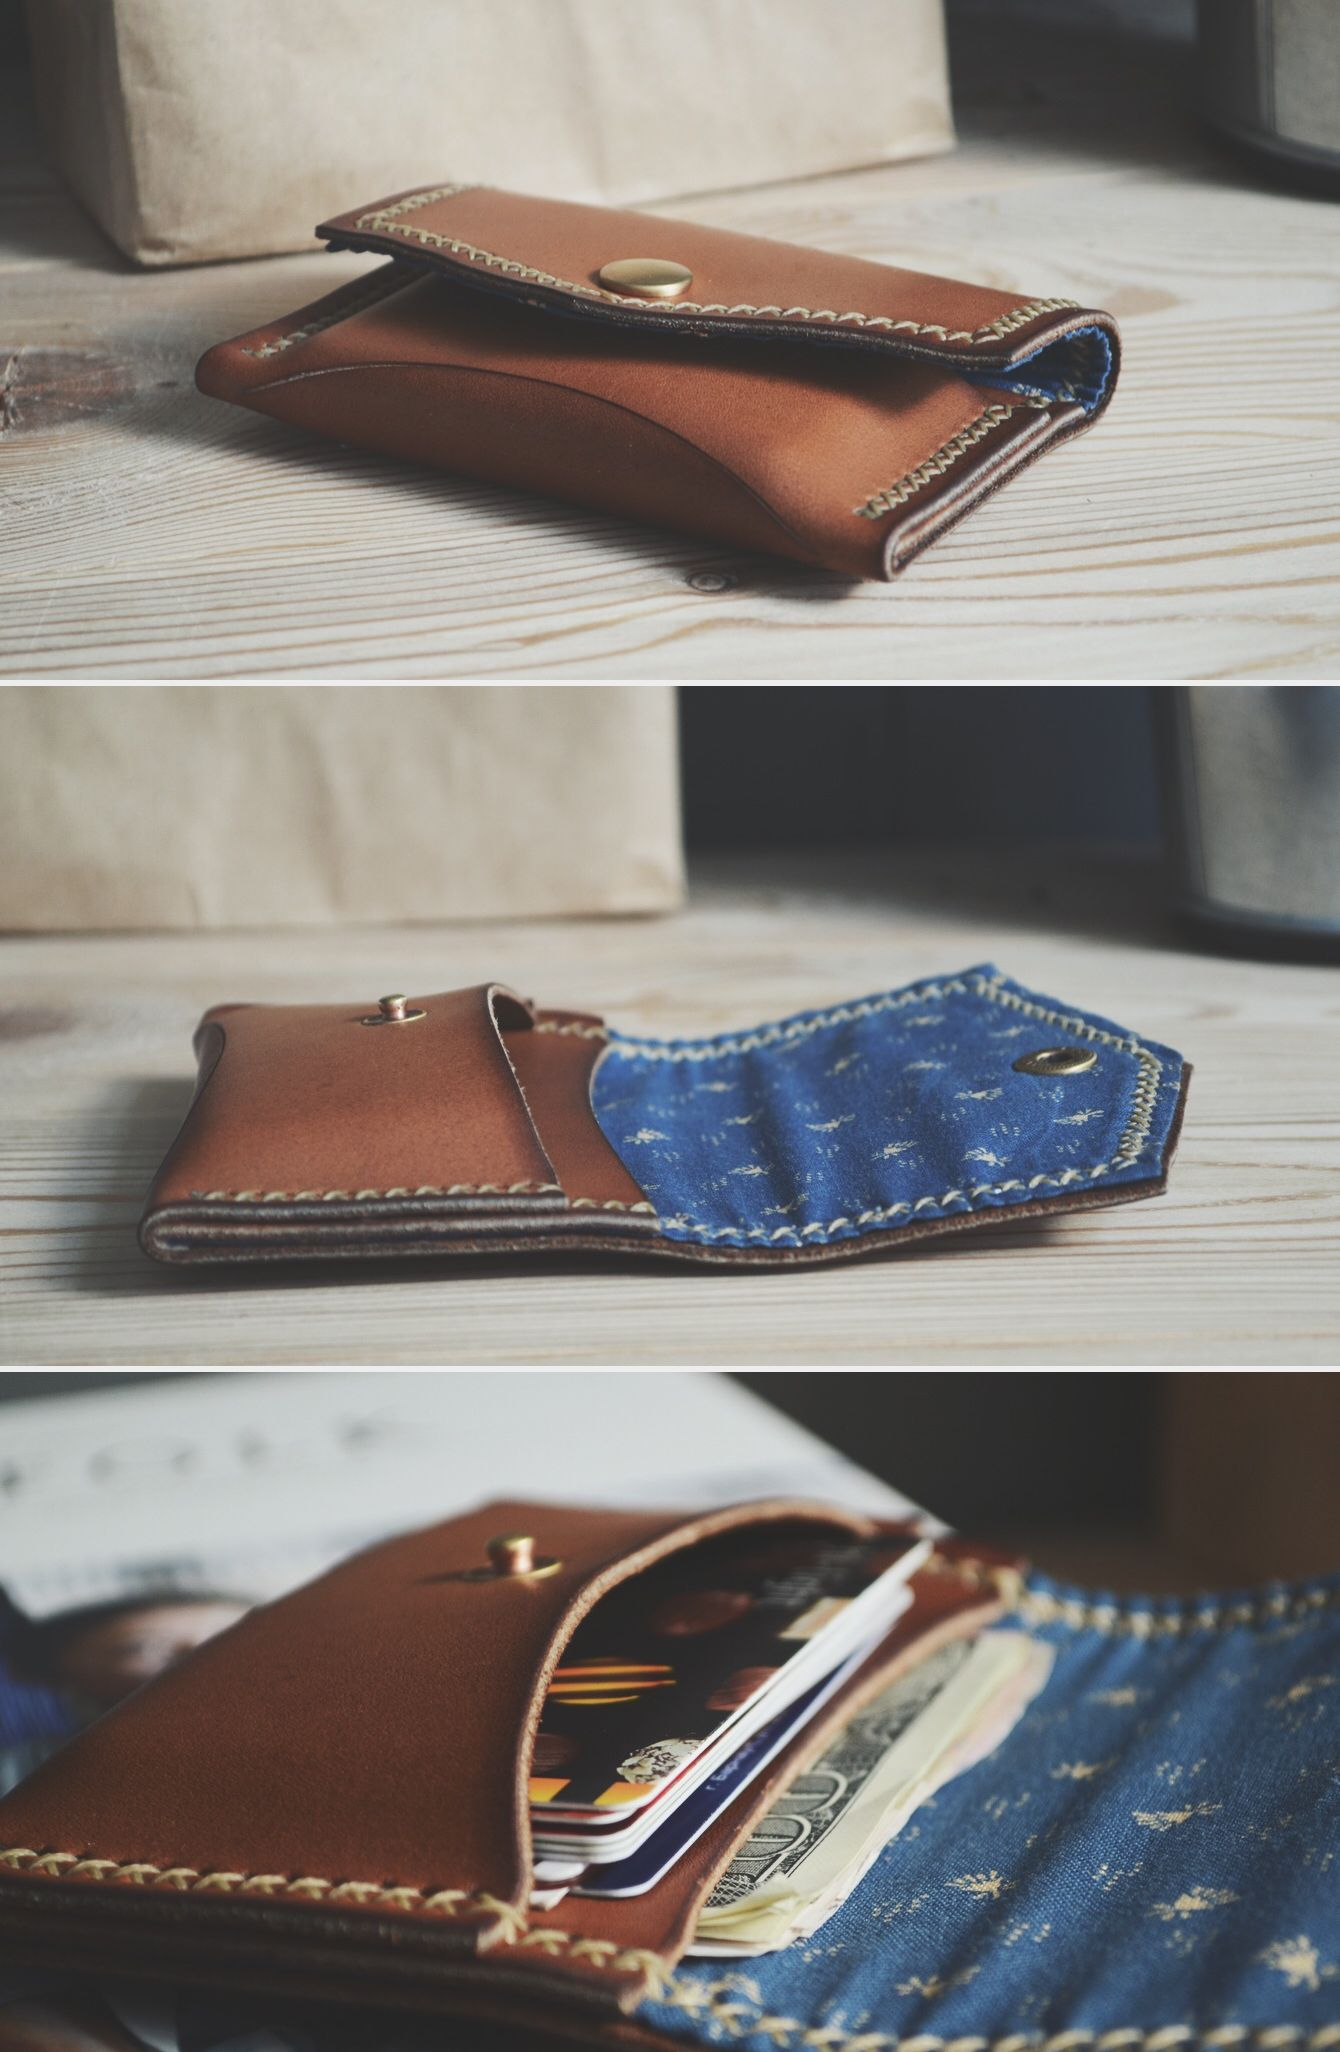 Pin von BANDANA GIRL auf Leather Inspirations | Pinterest | Leder ...